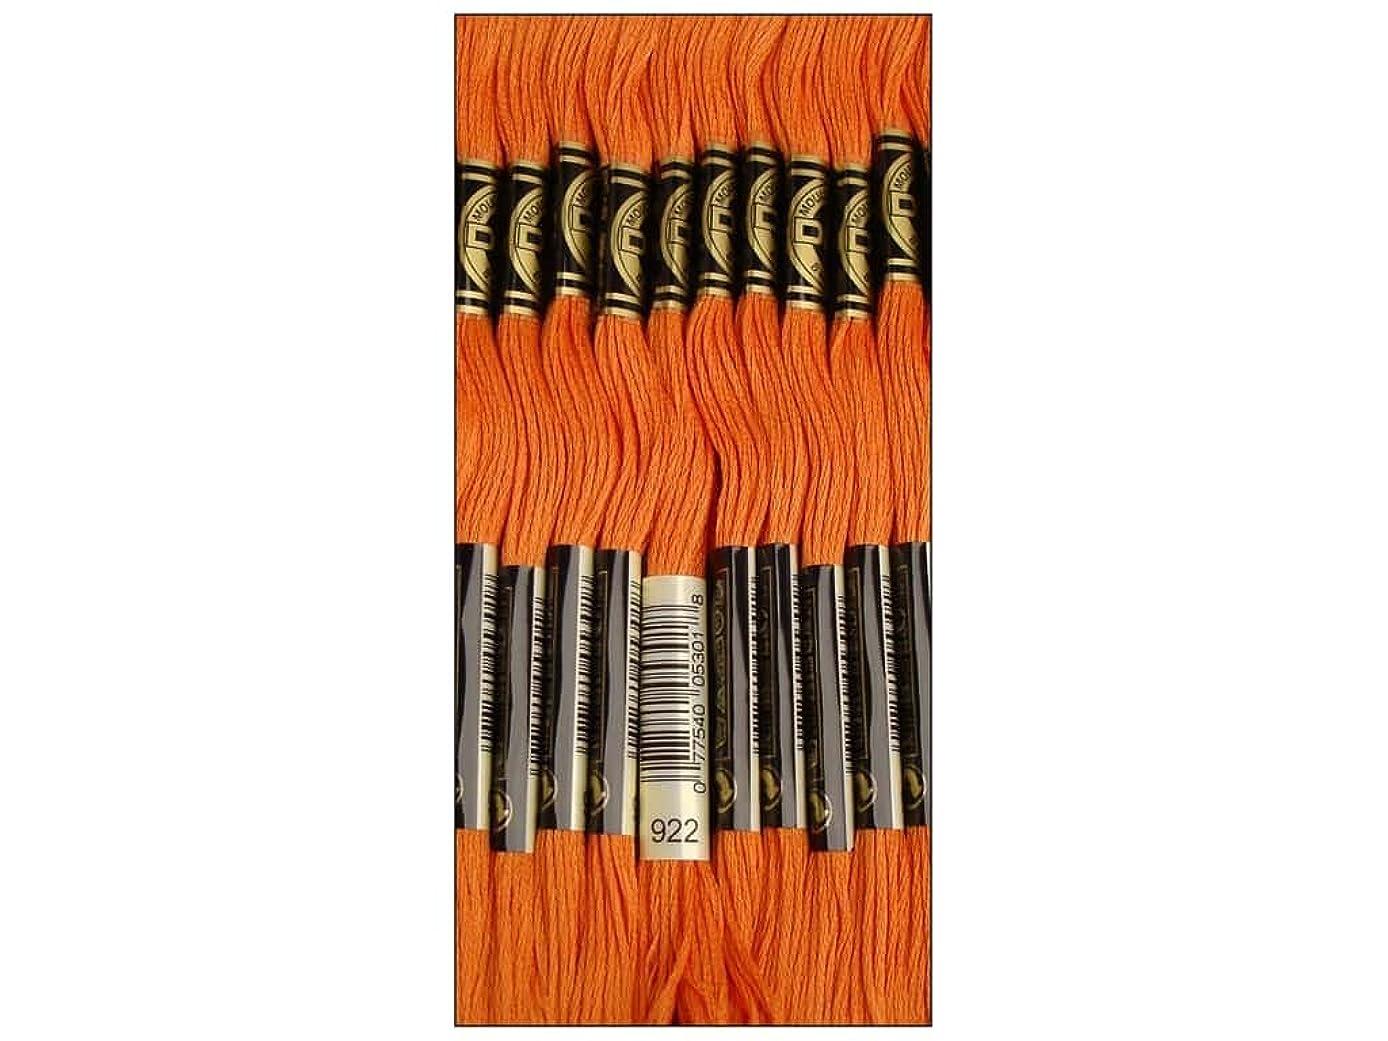 Bulk Buy: DMC Thread Six Strand Embroidery Cotton 8.7 Yards Light Copper 117-922 (12-Pack)